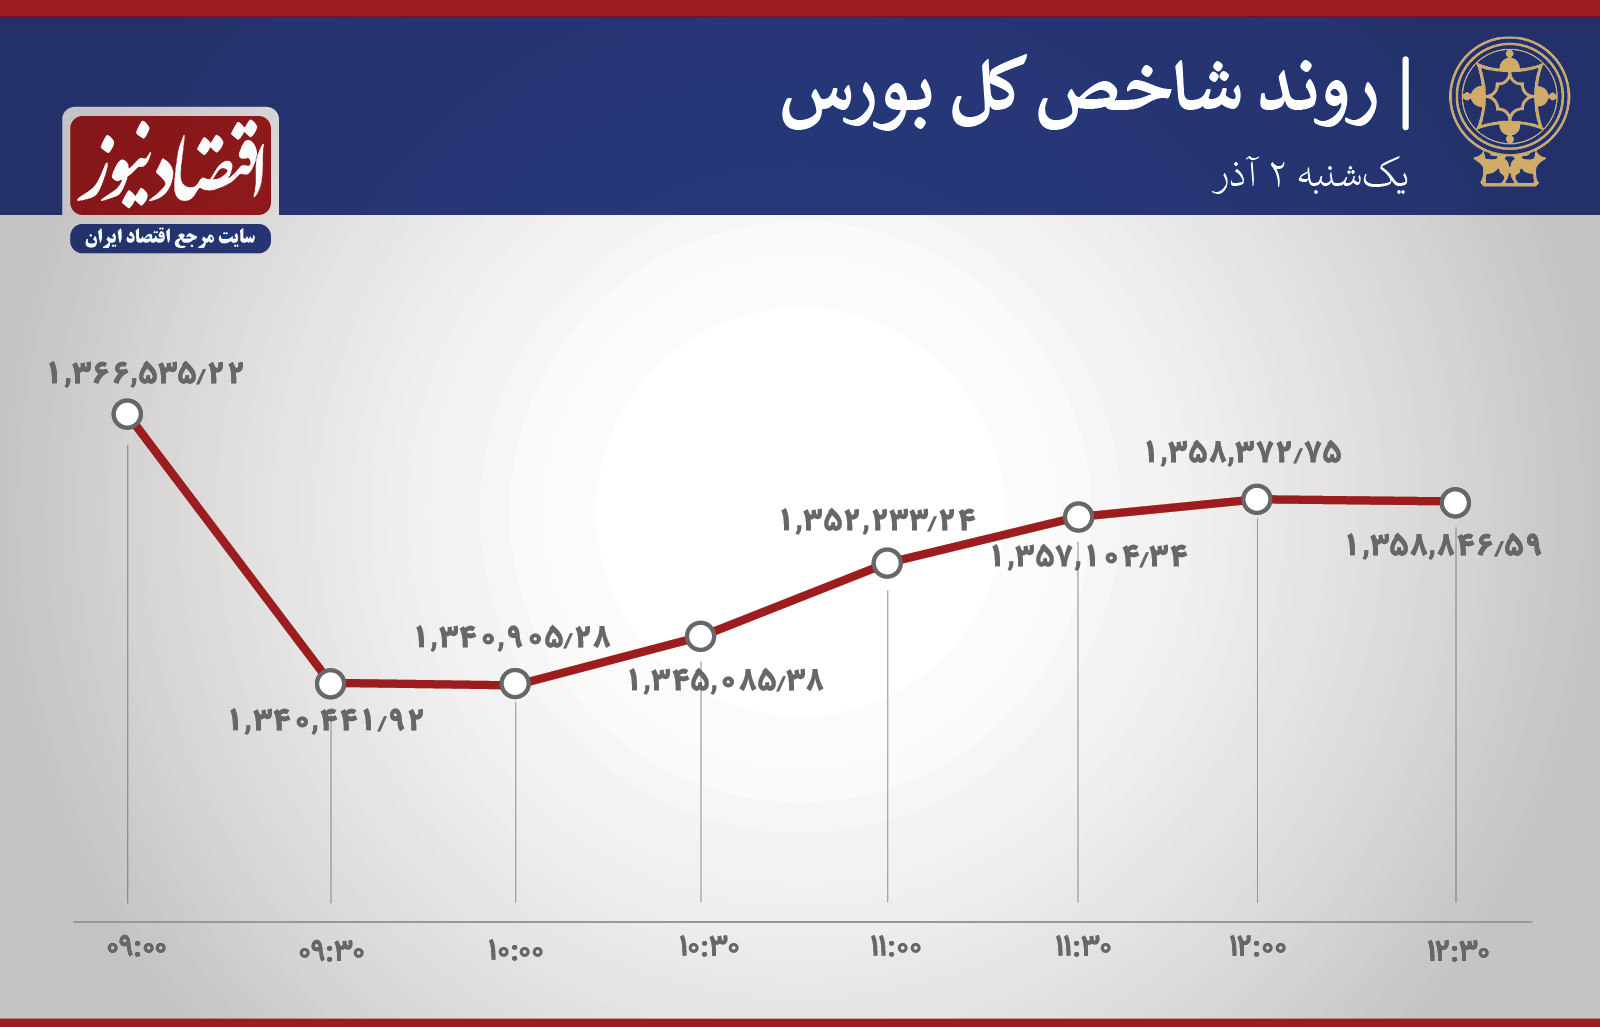 آمار معاملات 2 آذر